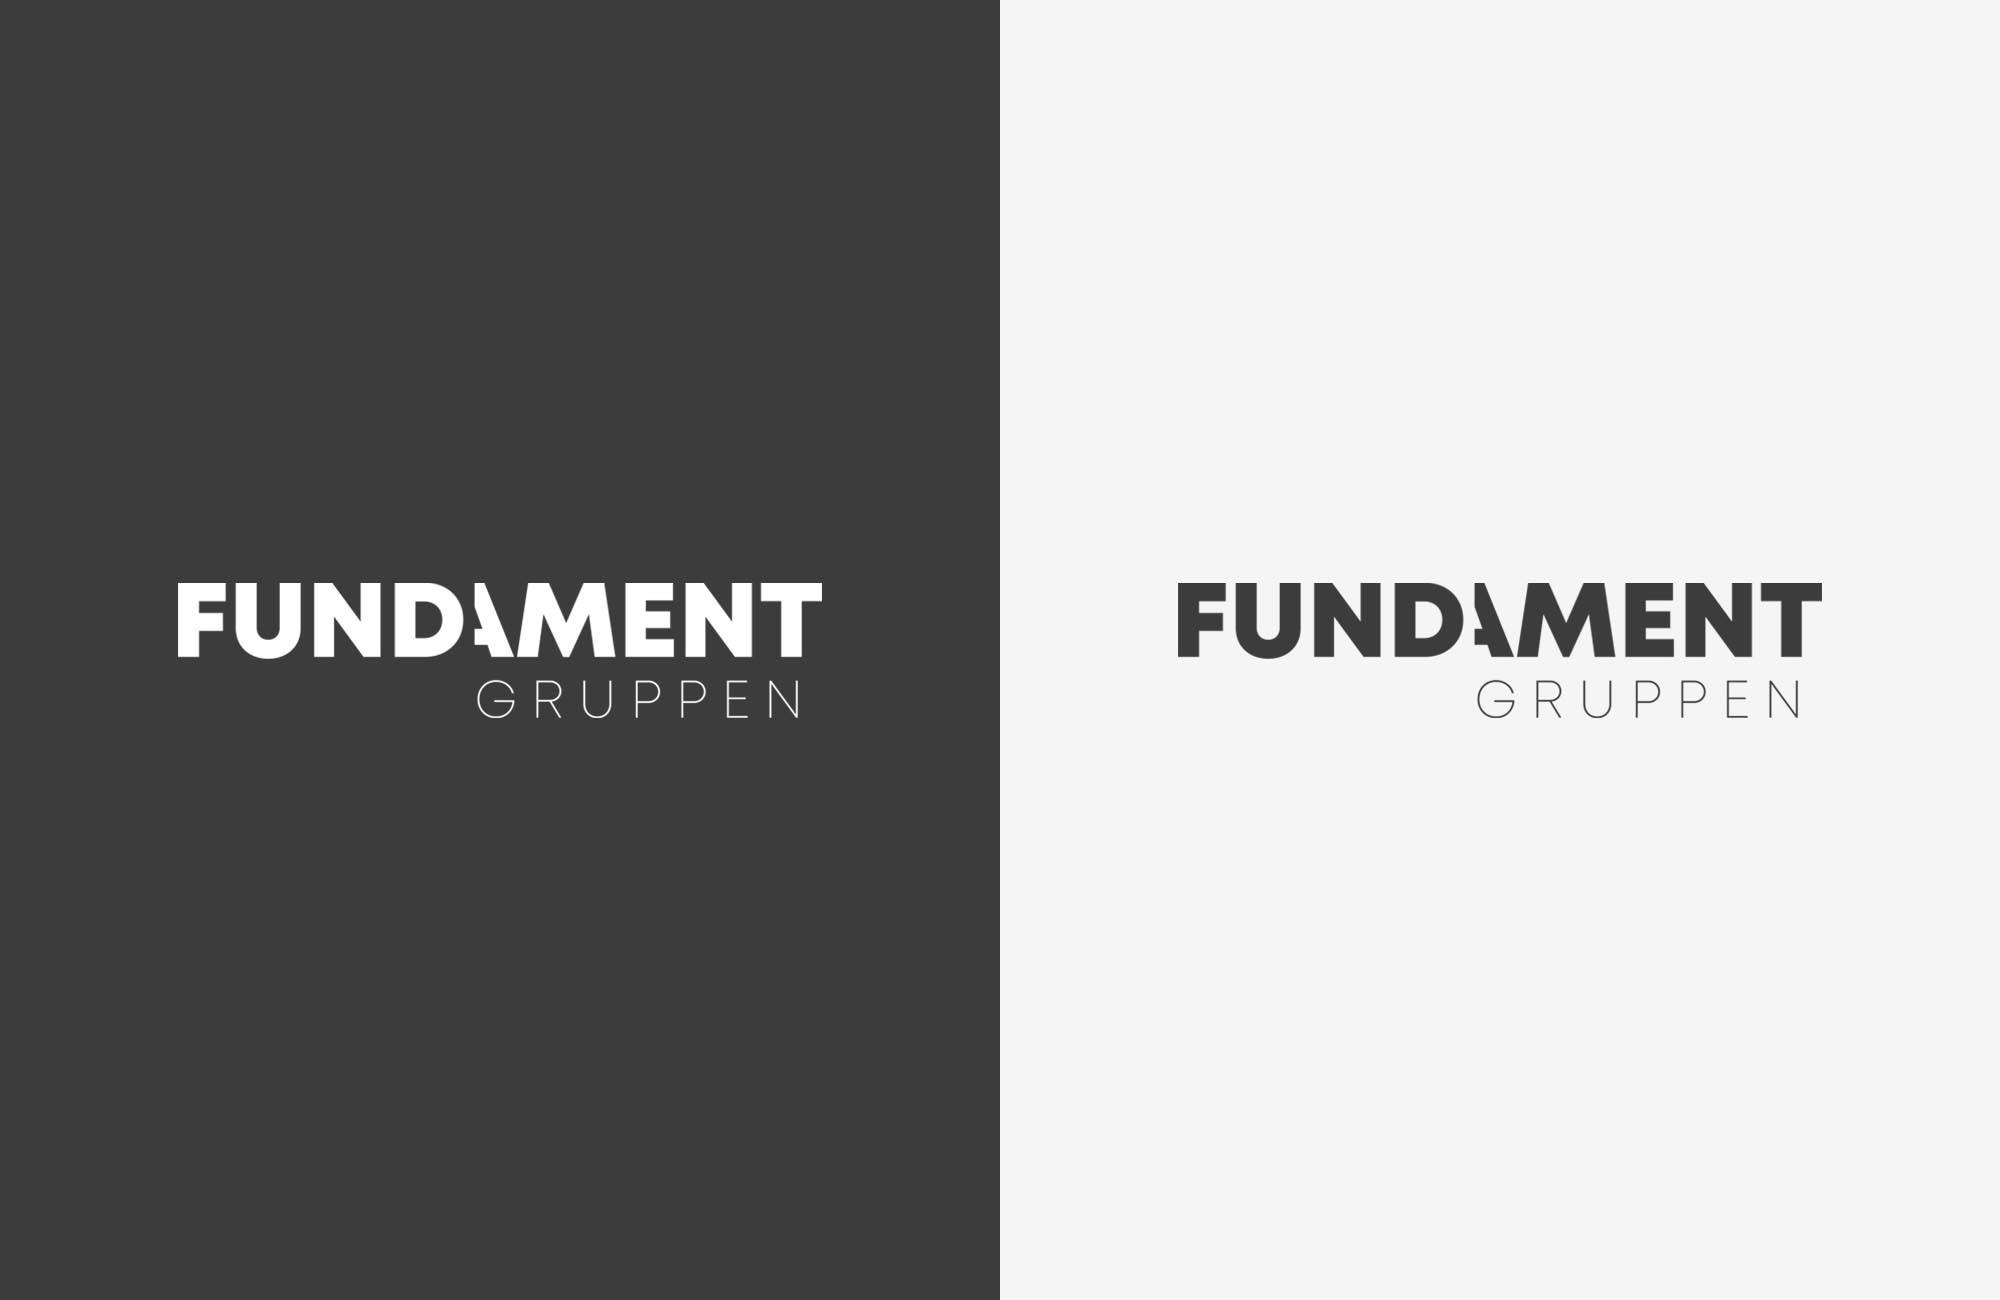 fundament_logo_1.jpg